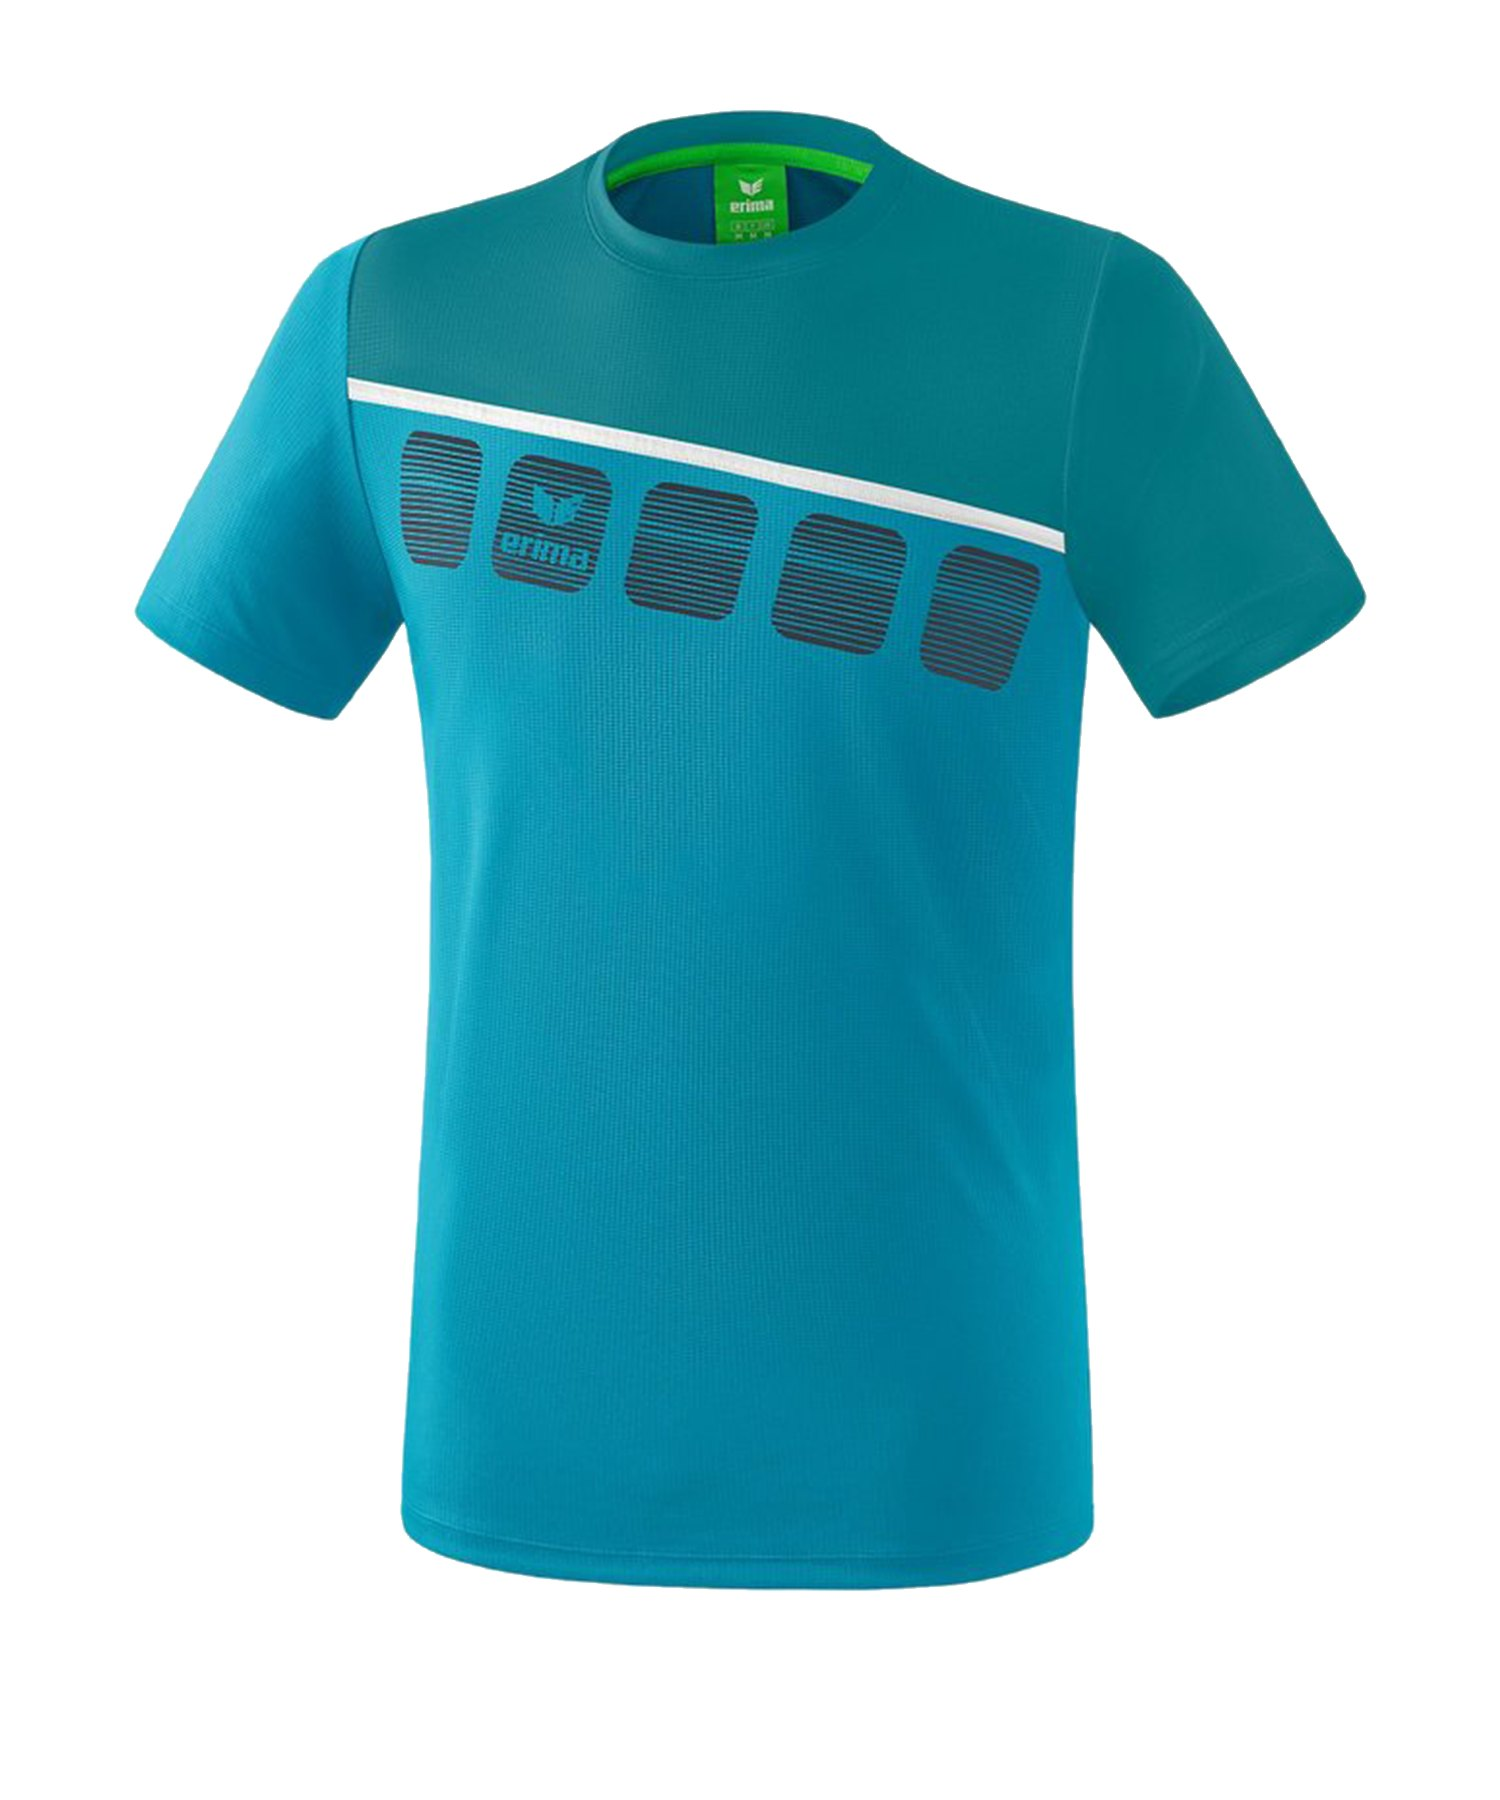 Erima 5-C T-Shirt Kids Blau Weiss - Blau